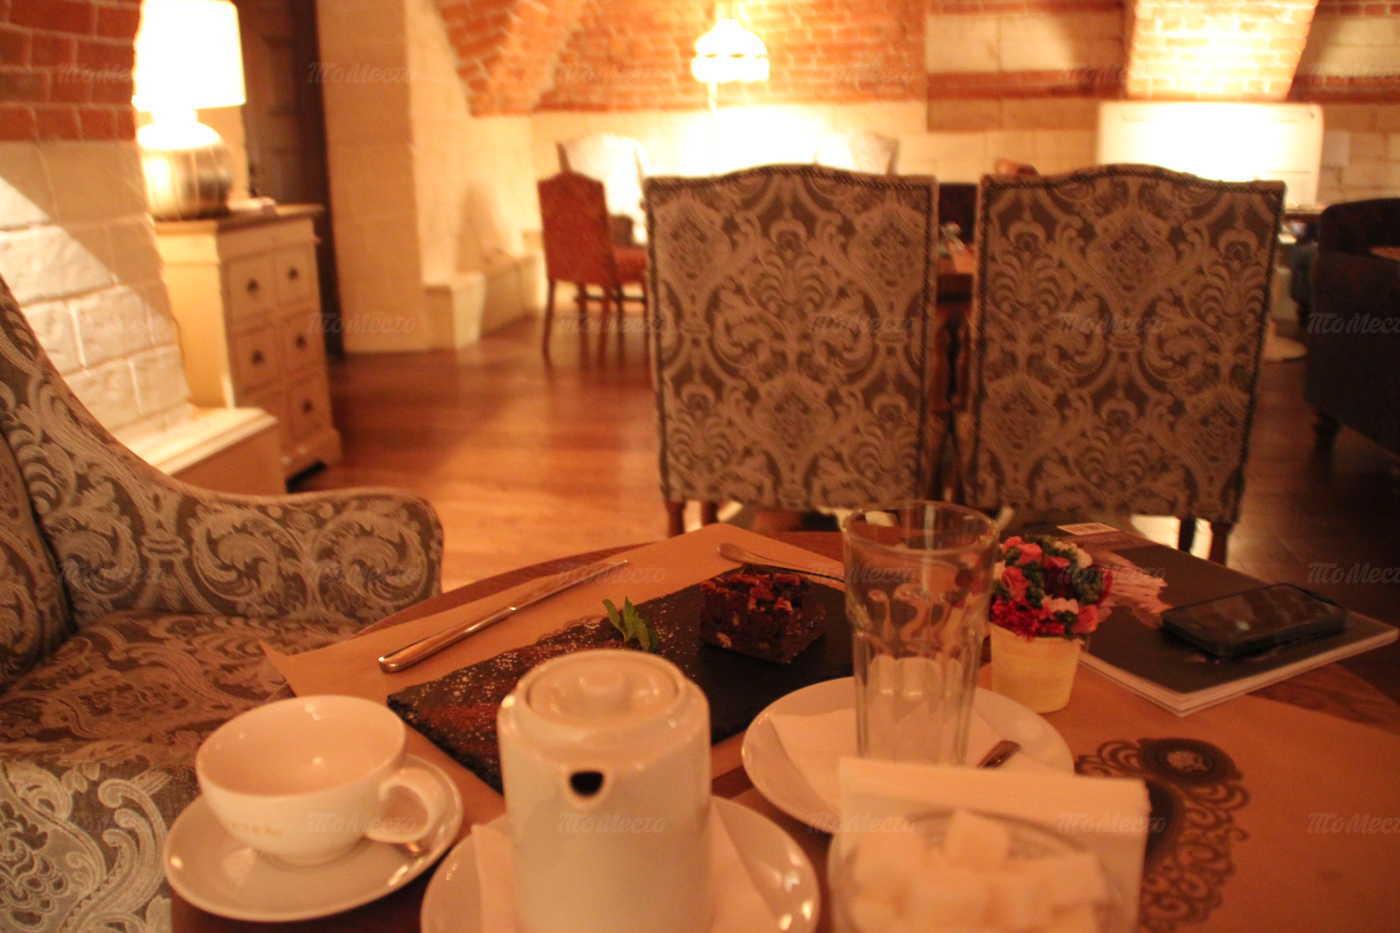 Меню ресторана DOME (D.O.M.E) на Комсомольском проспекте